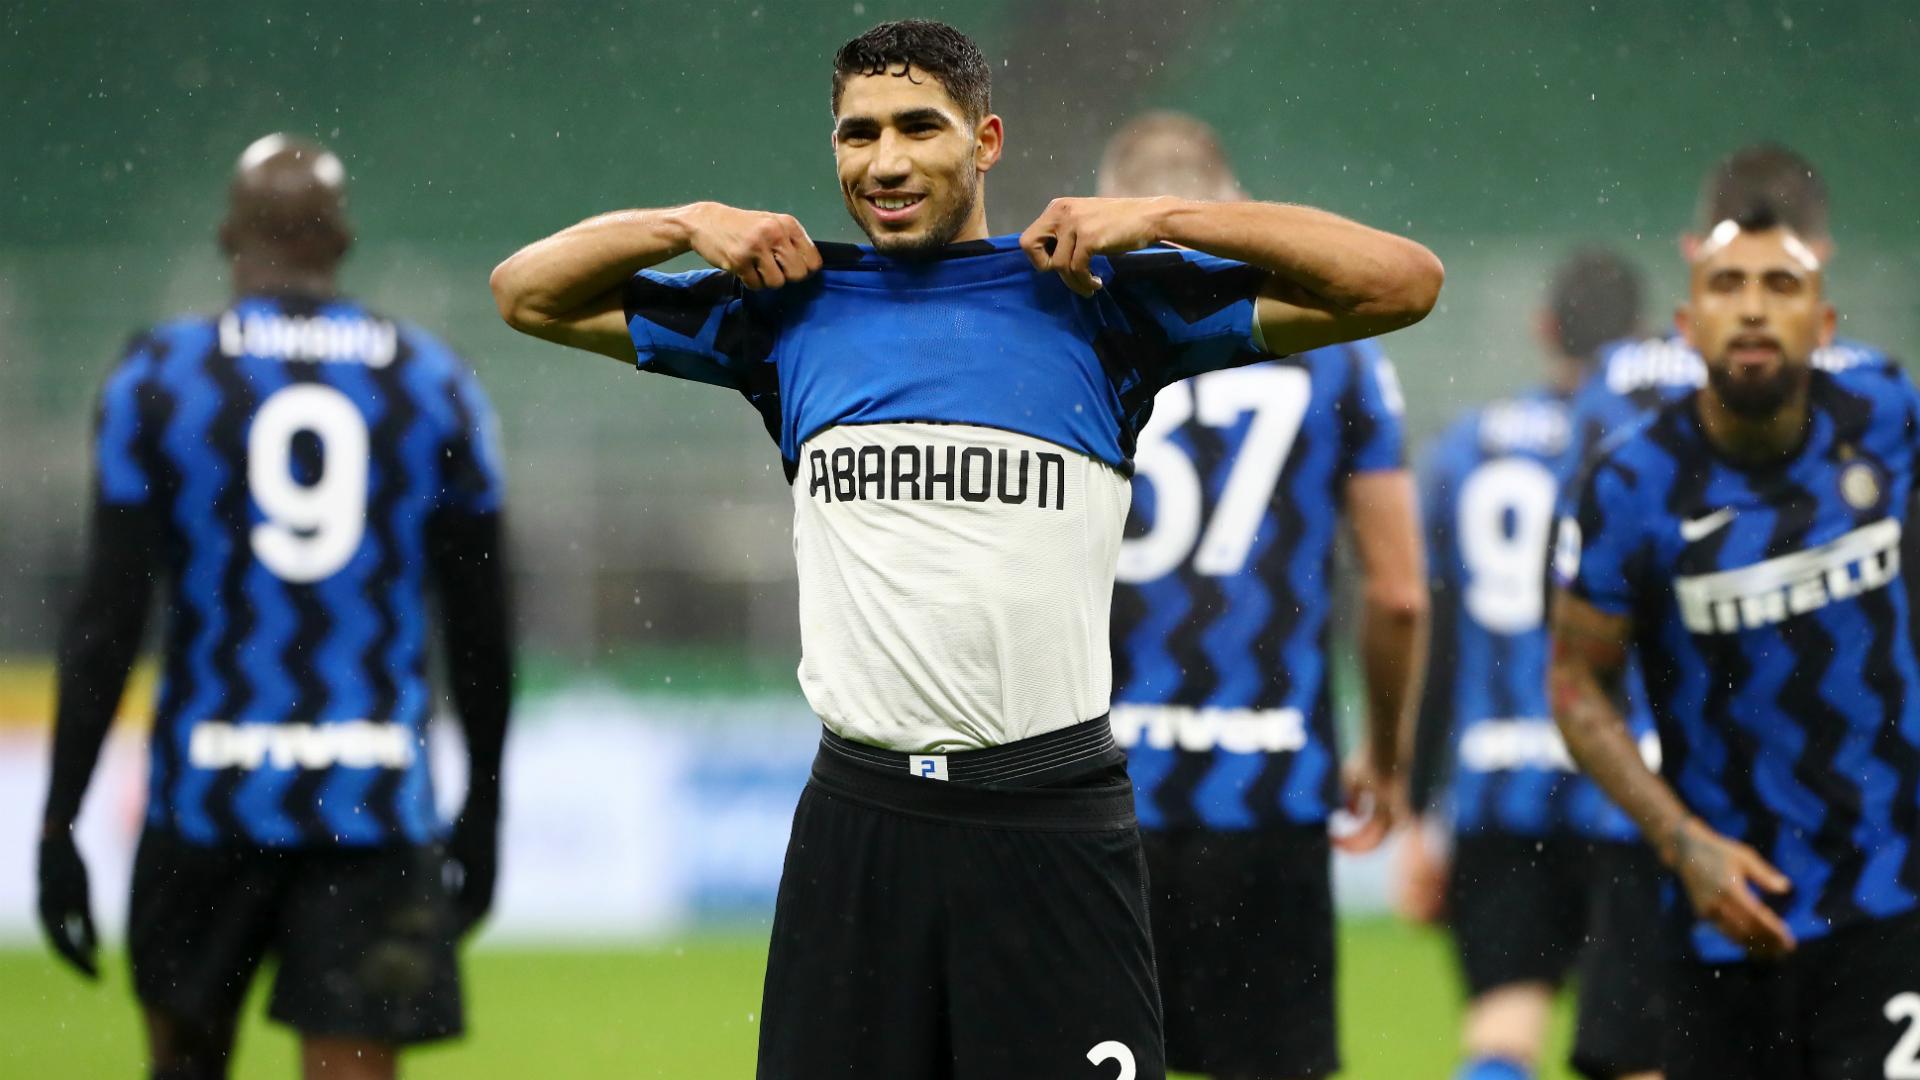 Inter Milan wing-back Hakimi dedicates Serie A brace to late Morocco  defender Abarhoun   Goal.com